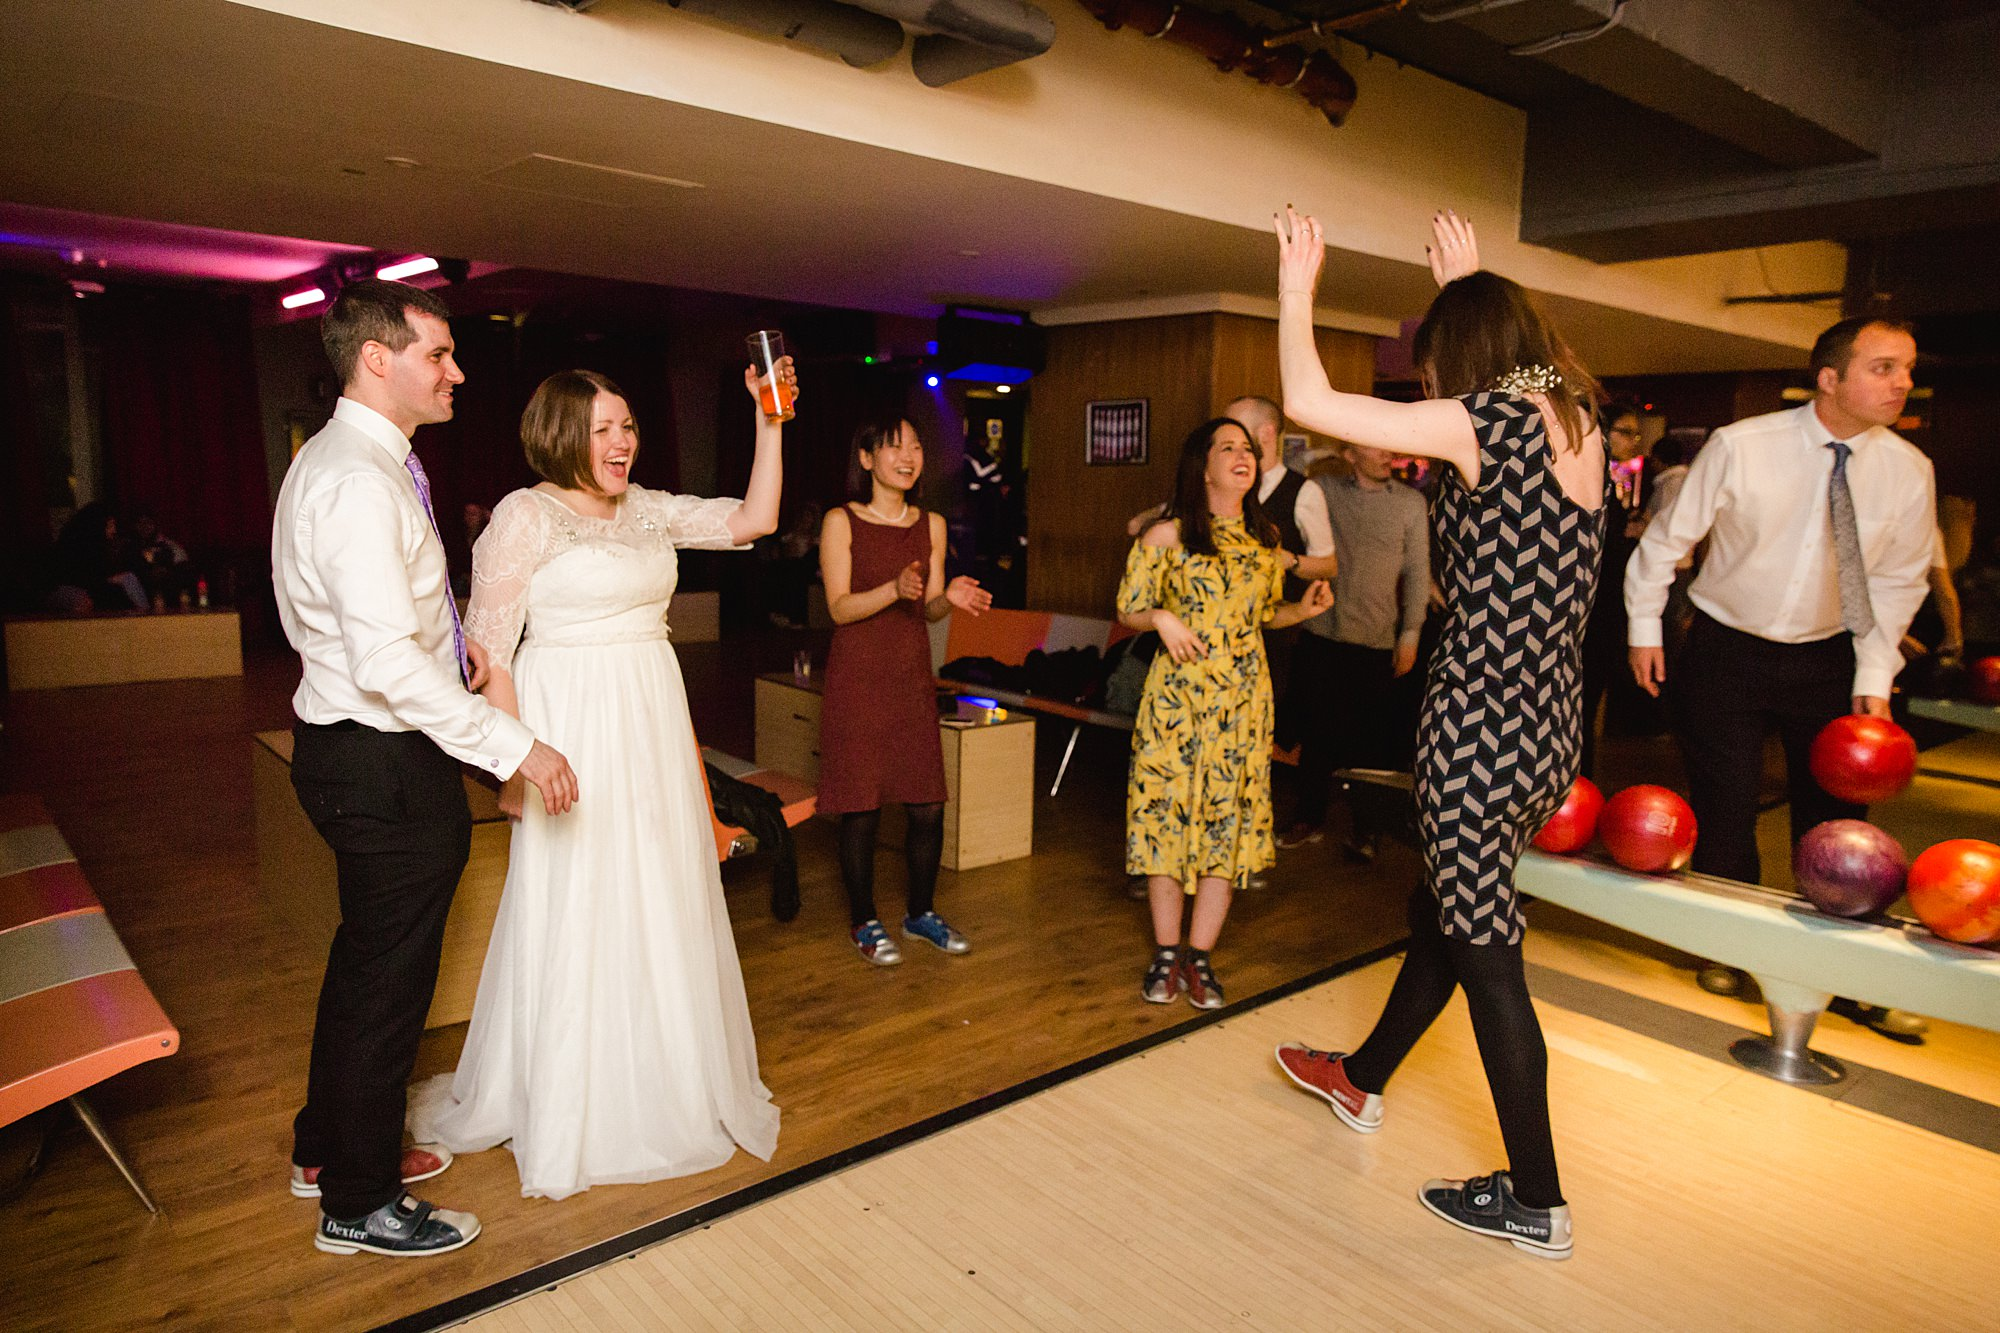 fun london wedding bowling guest celebrates win